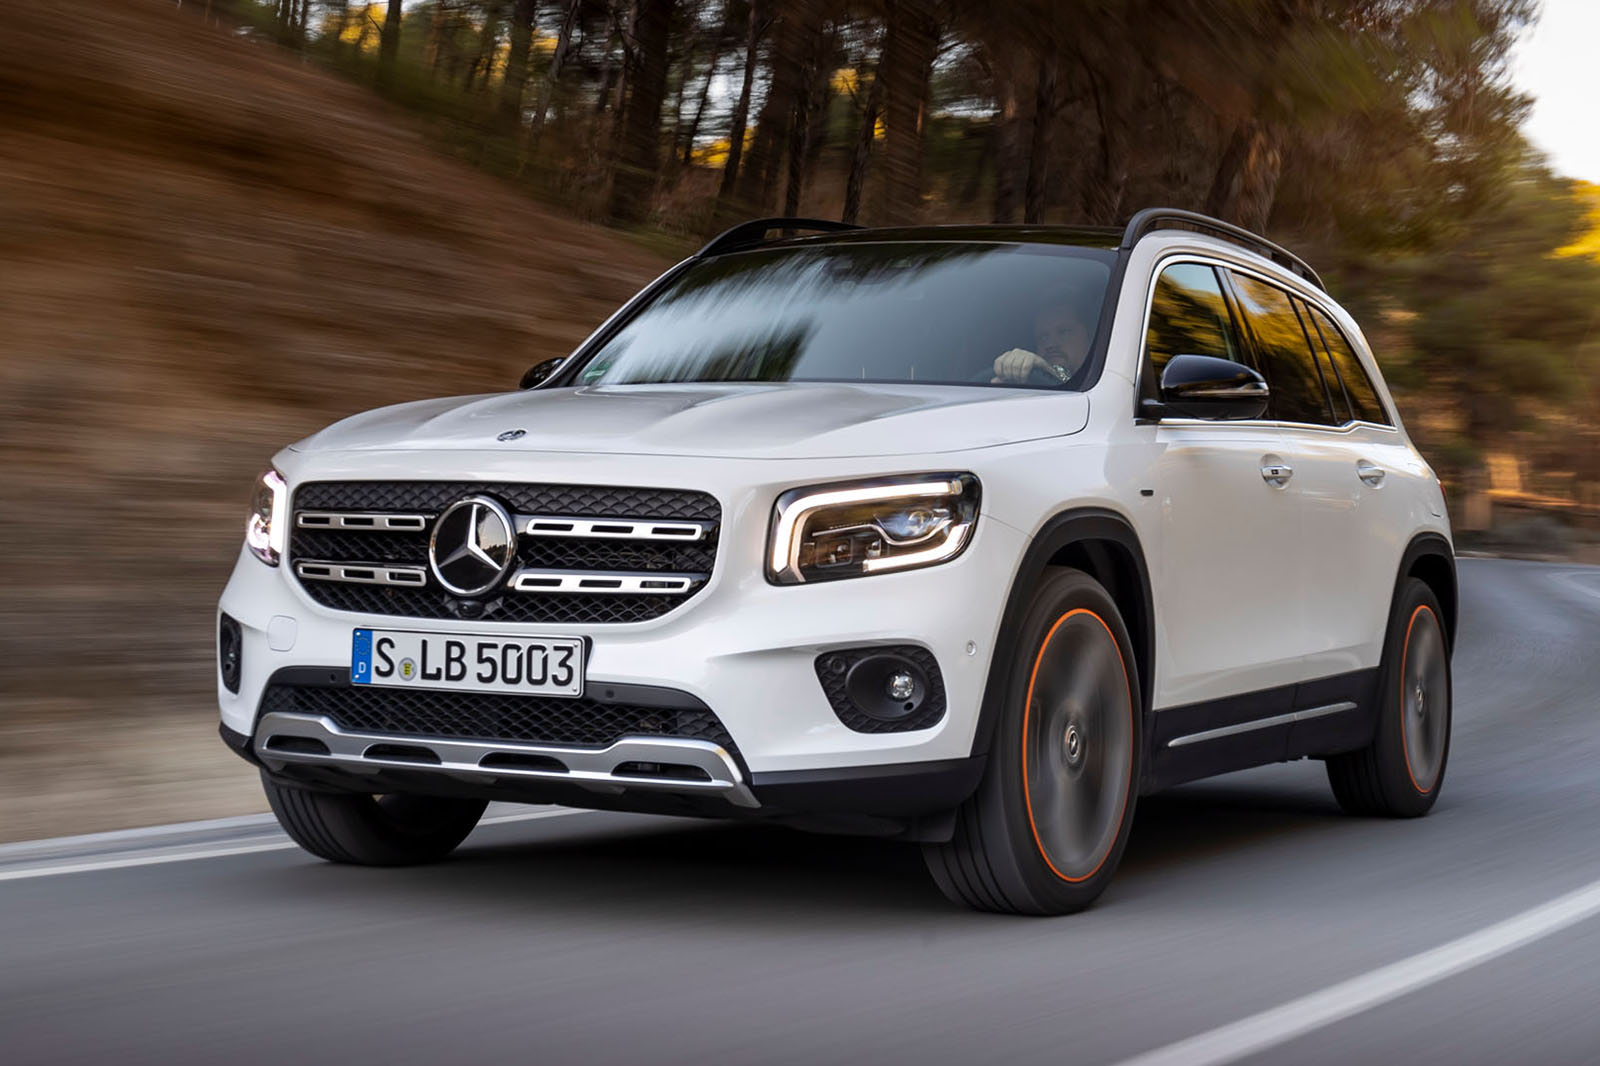 Mercedes-Benz GLB 200 2019 review